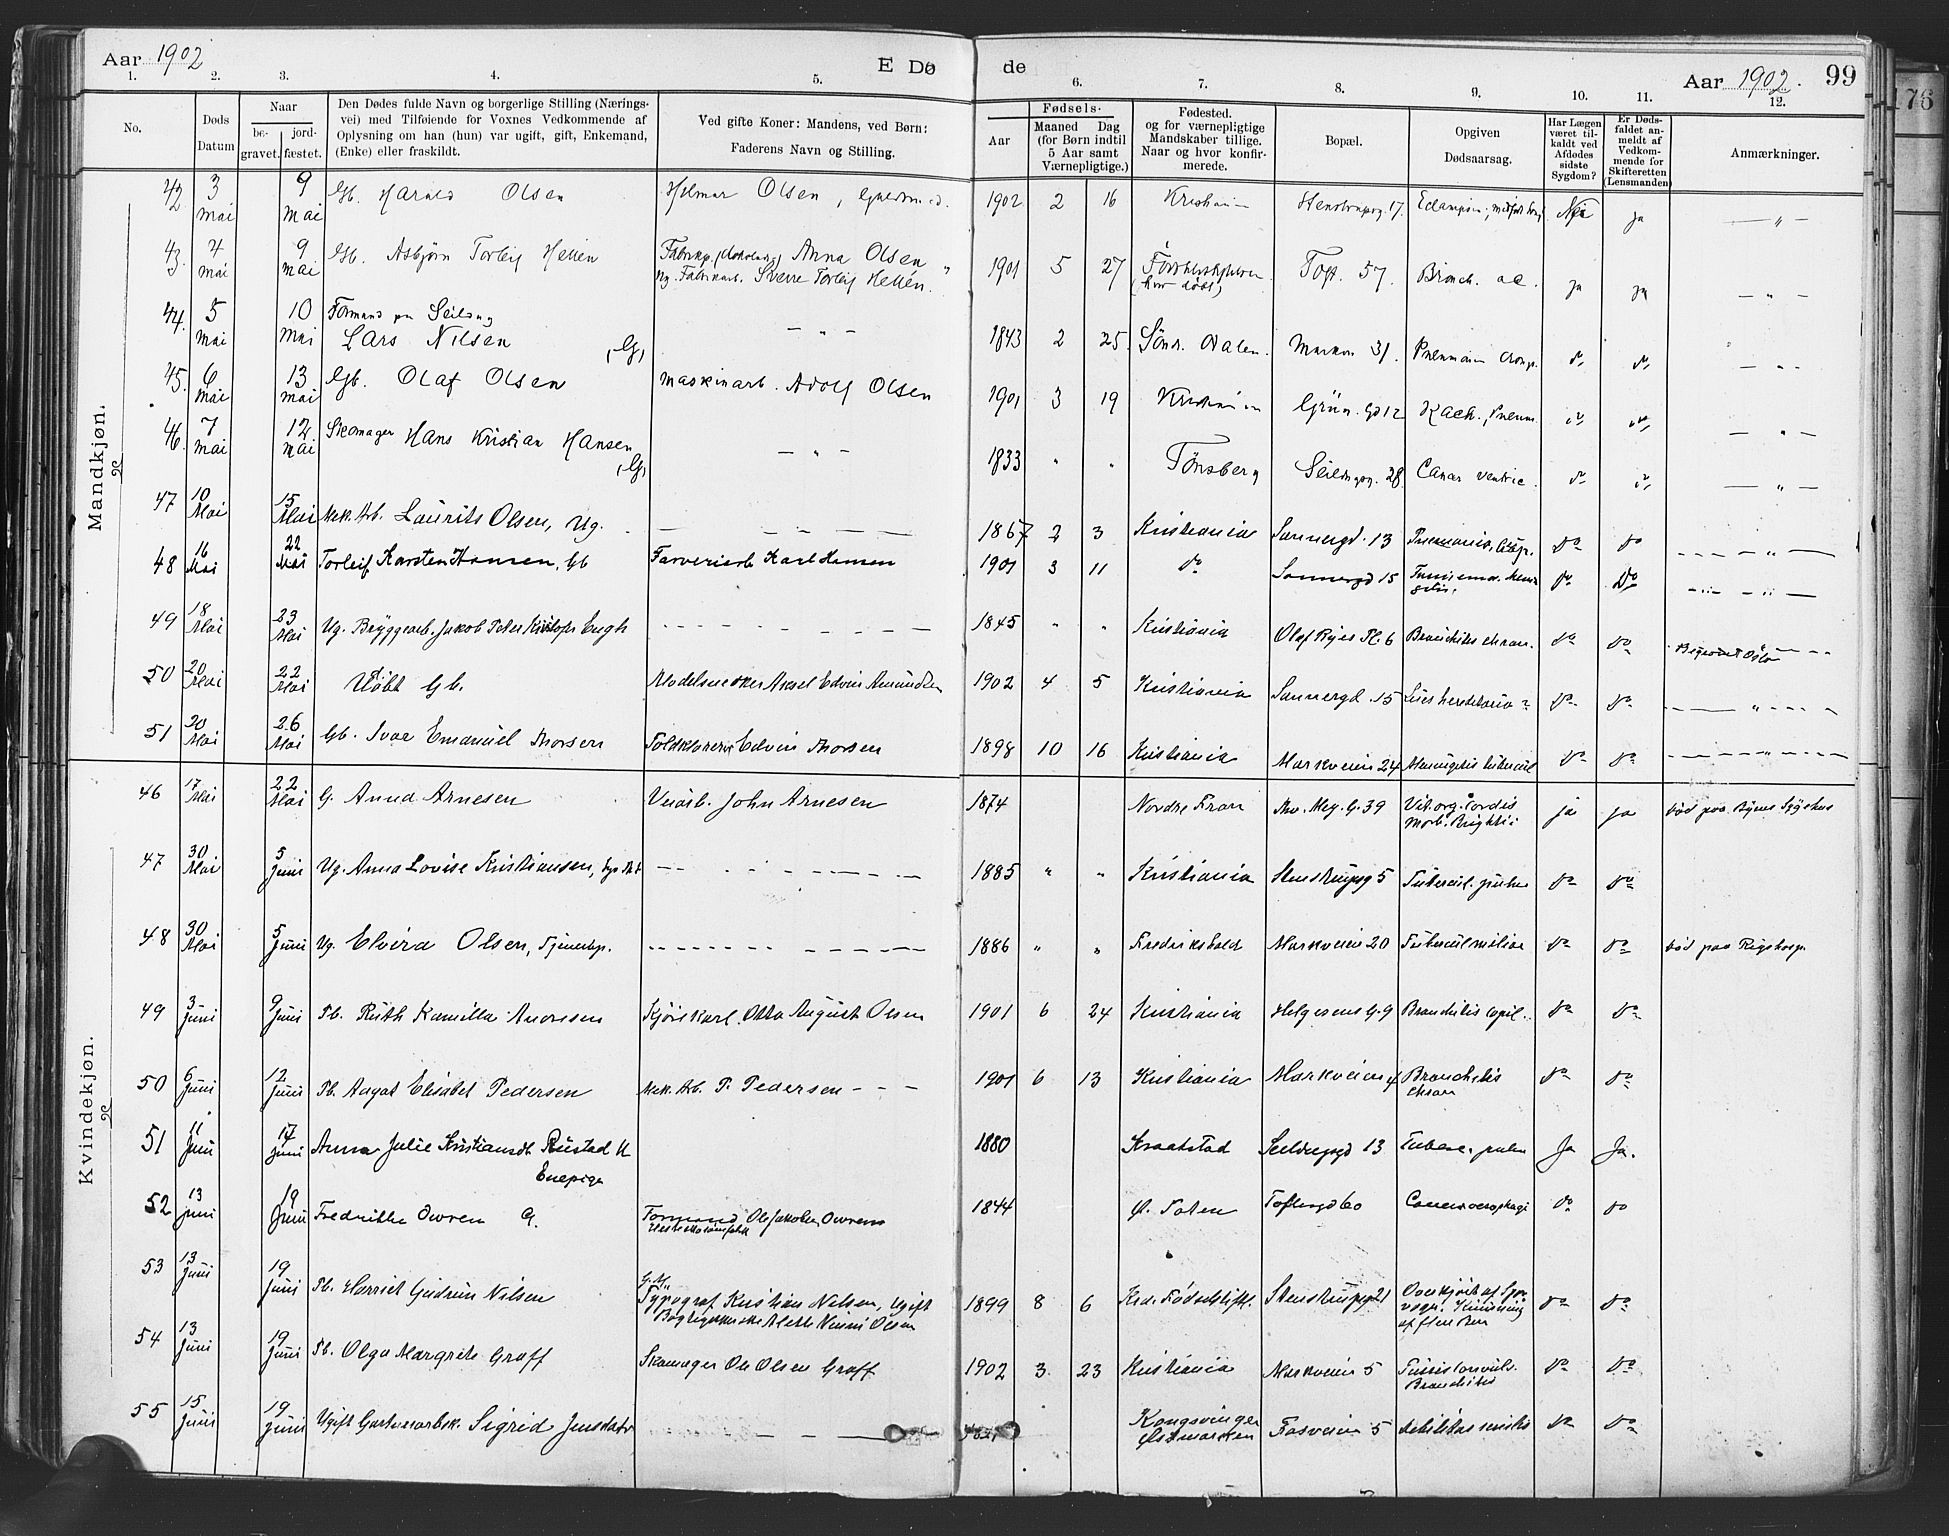 SAO, Paulus prestekontor Kirkebøker, F/Fa/L0012: Ministerialbok nr. 12, 1897-1908, s. 99